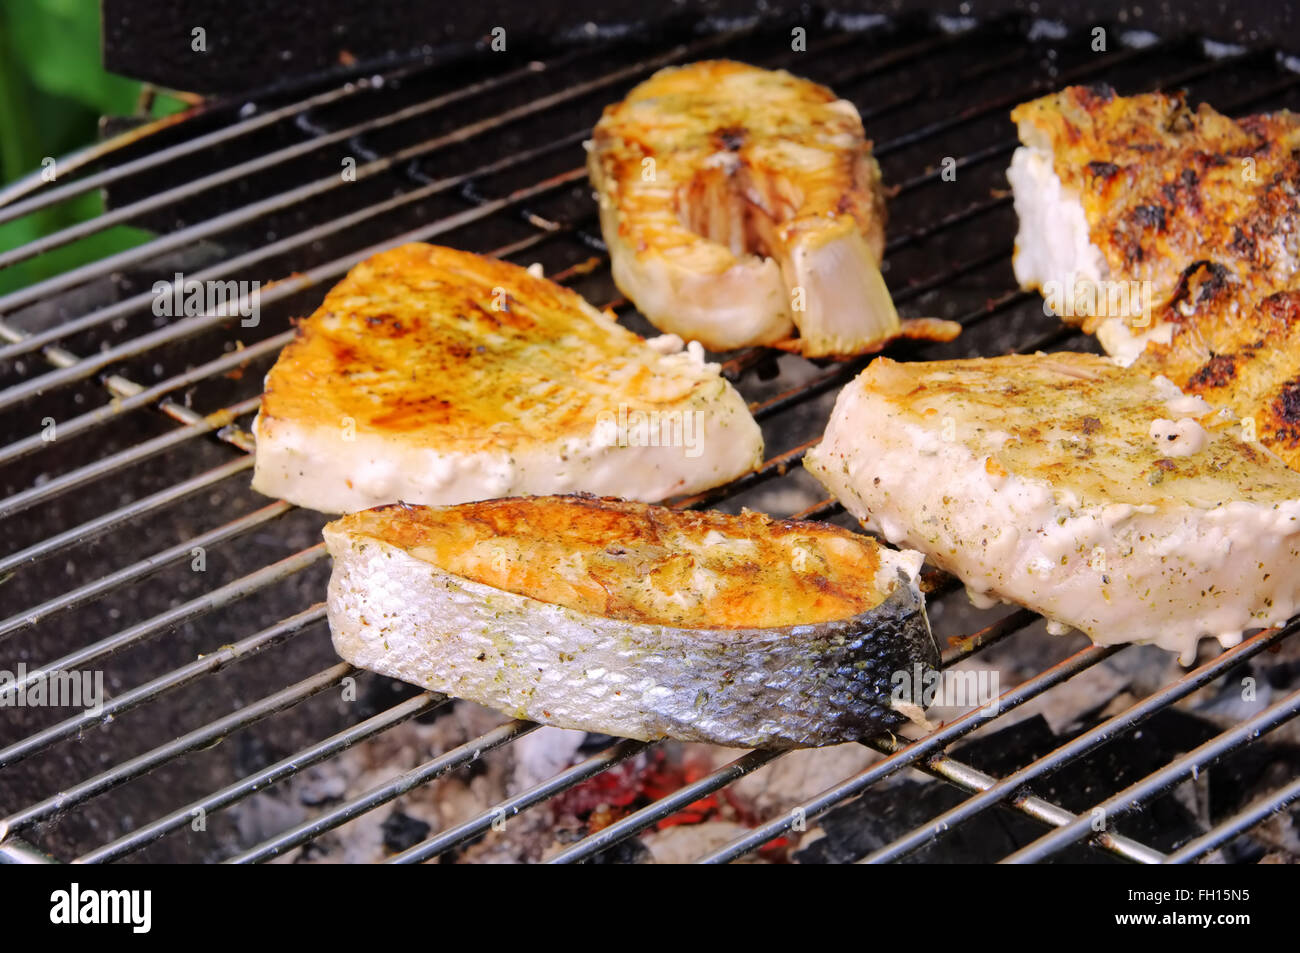 Grillen Fischsteak - grilling steak from fish 09 - Stock Image